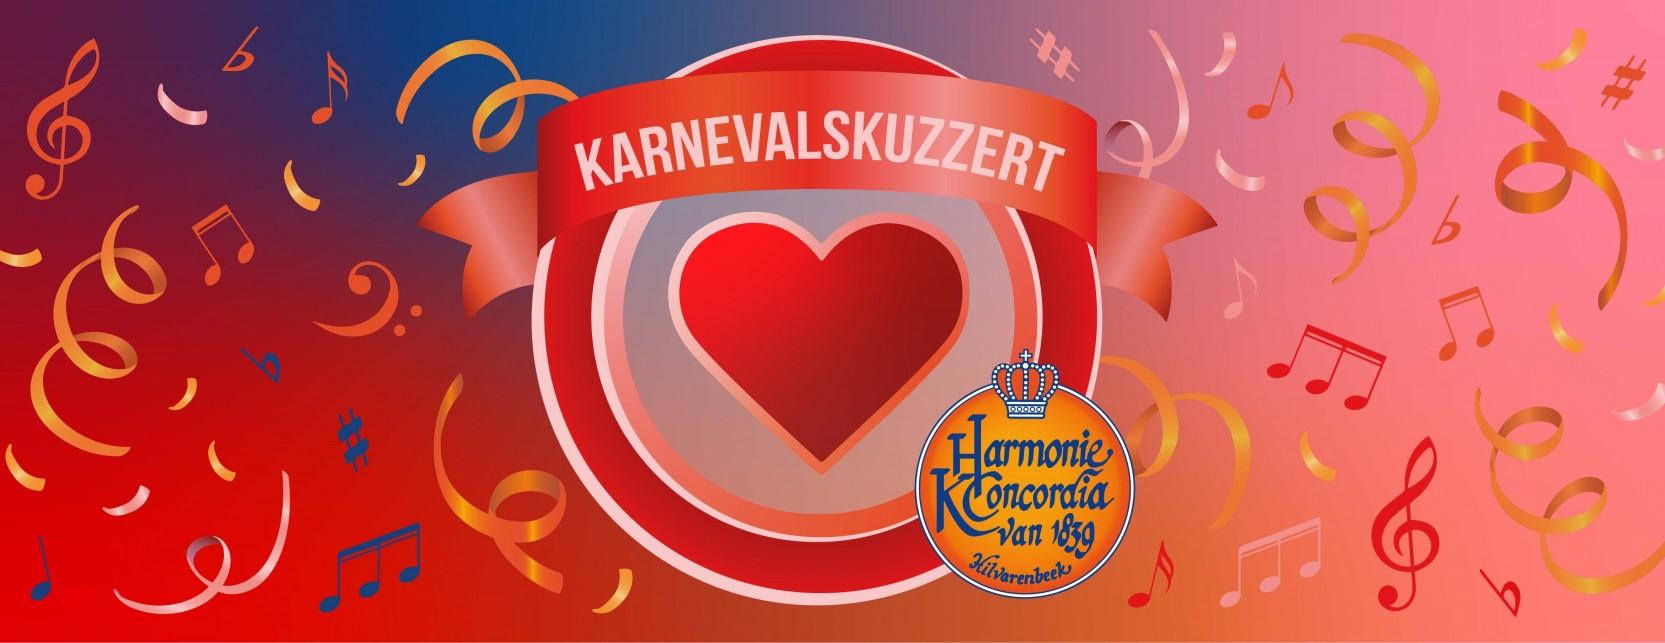 khc_karnevalskuzzert_2020